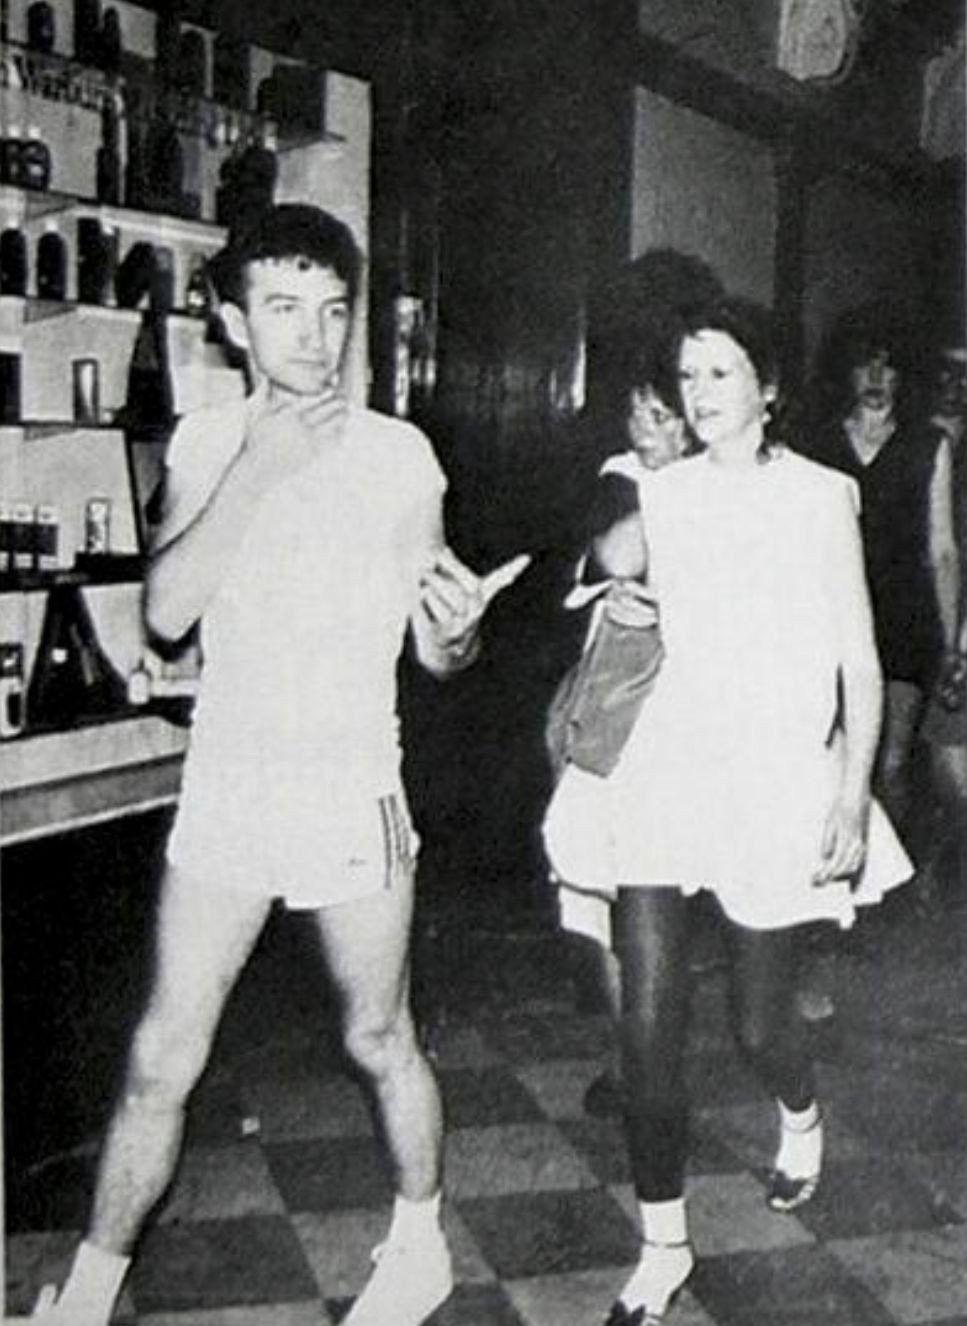 John Deacon Veronica Tetzlaff : deacon, veronica, tetzlaff, Deacon, Lovely, Wife,, Veronica, Tetzlaff., Other, Information, About, Photography, Tetzlaff,, Queen, Freddie, Mercury,